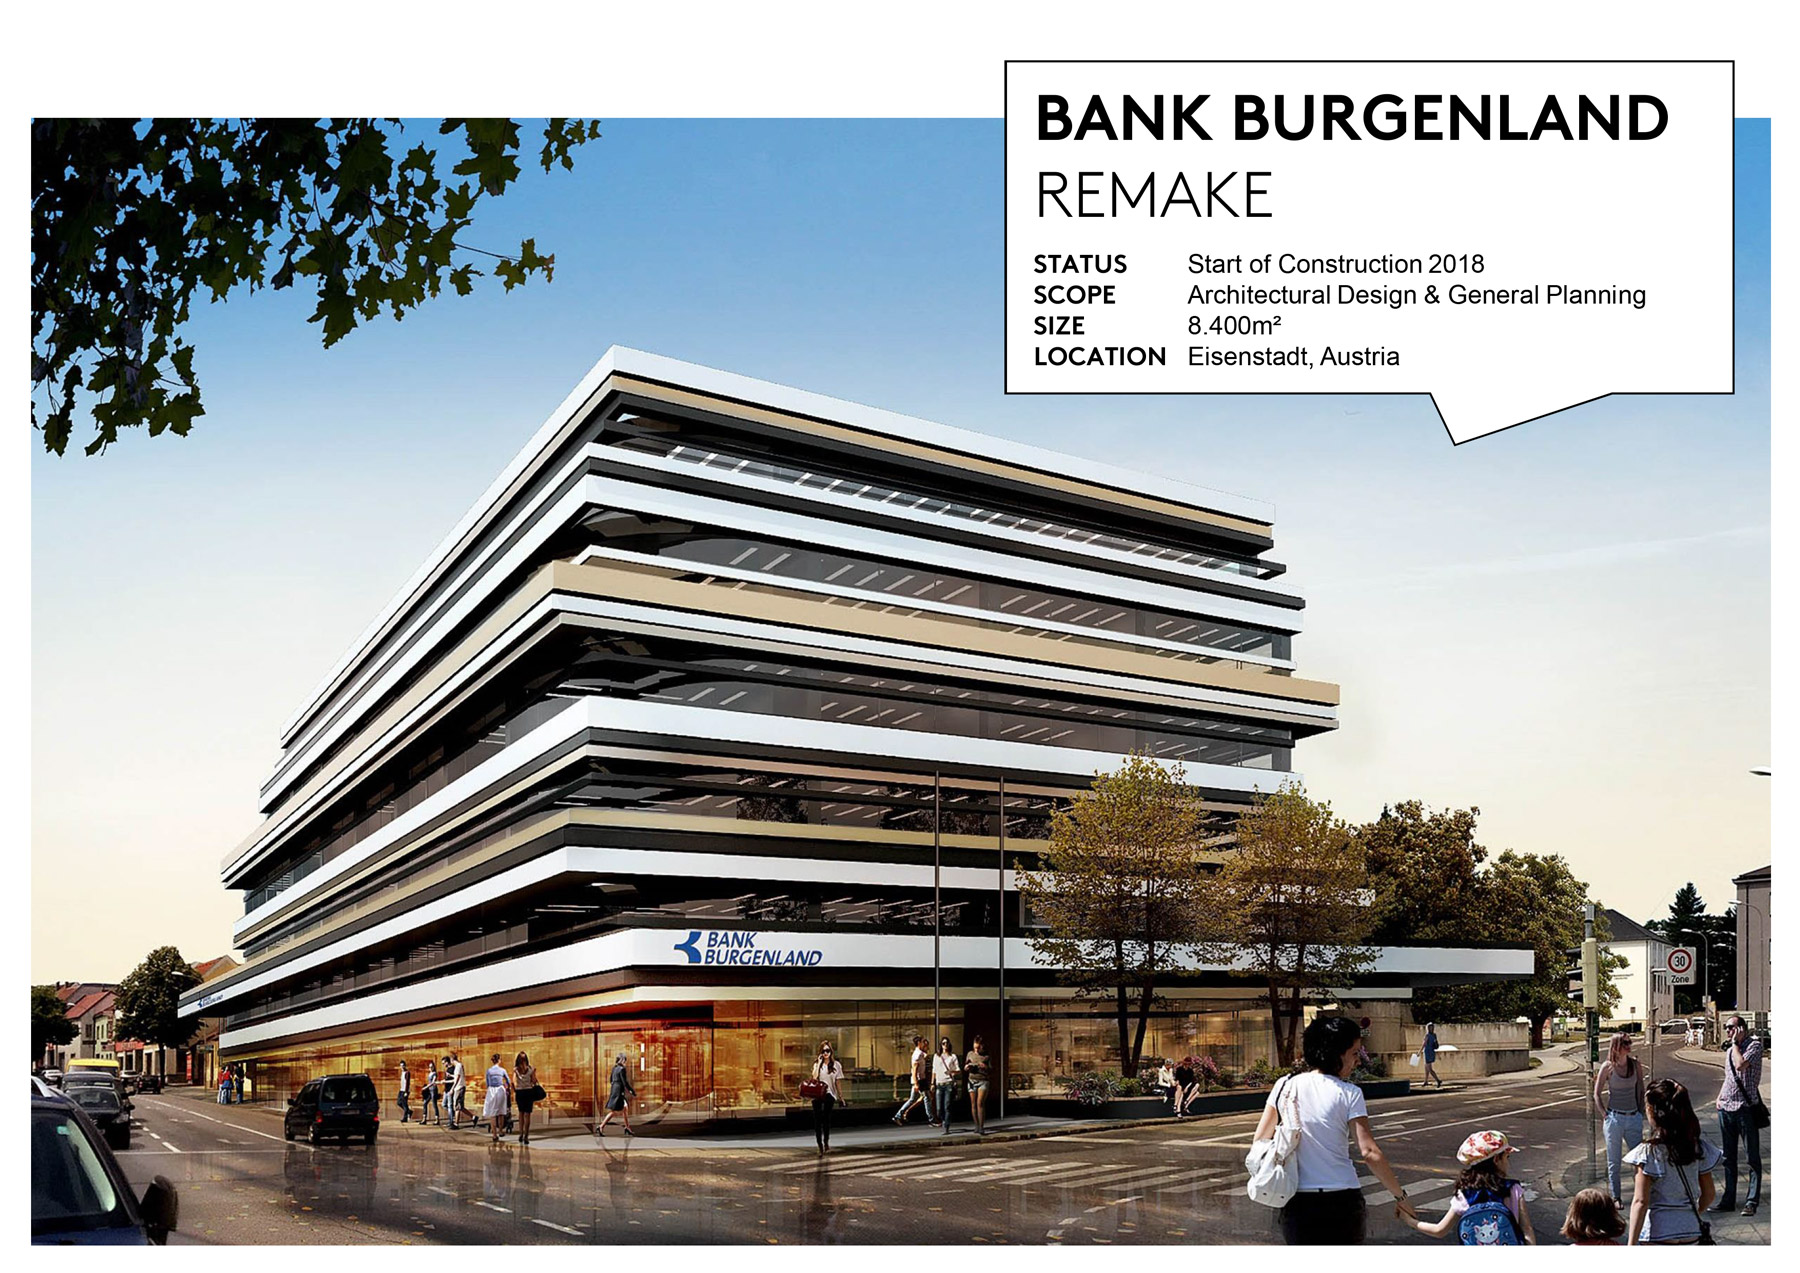 325_ZBB_bank_burgenland_slide_02